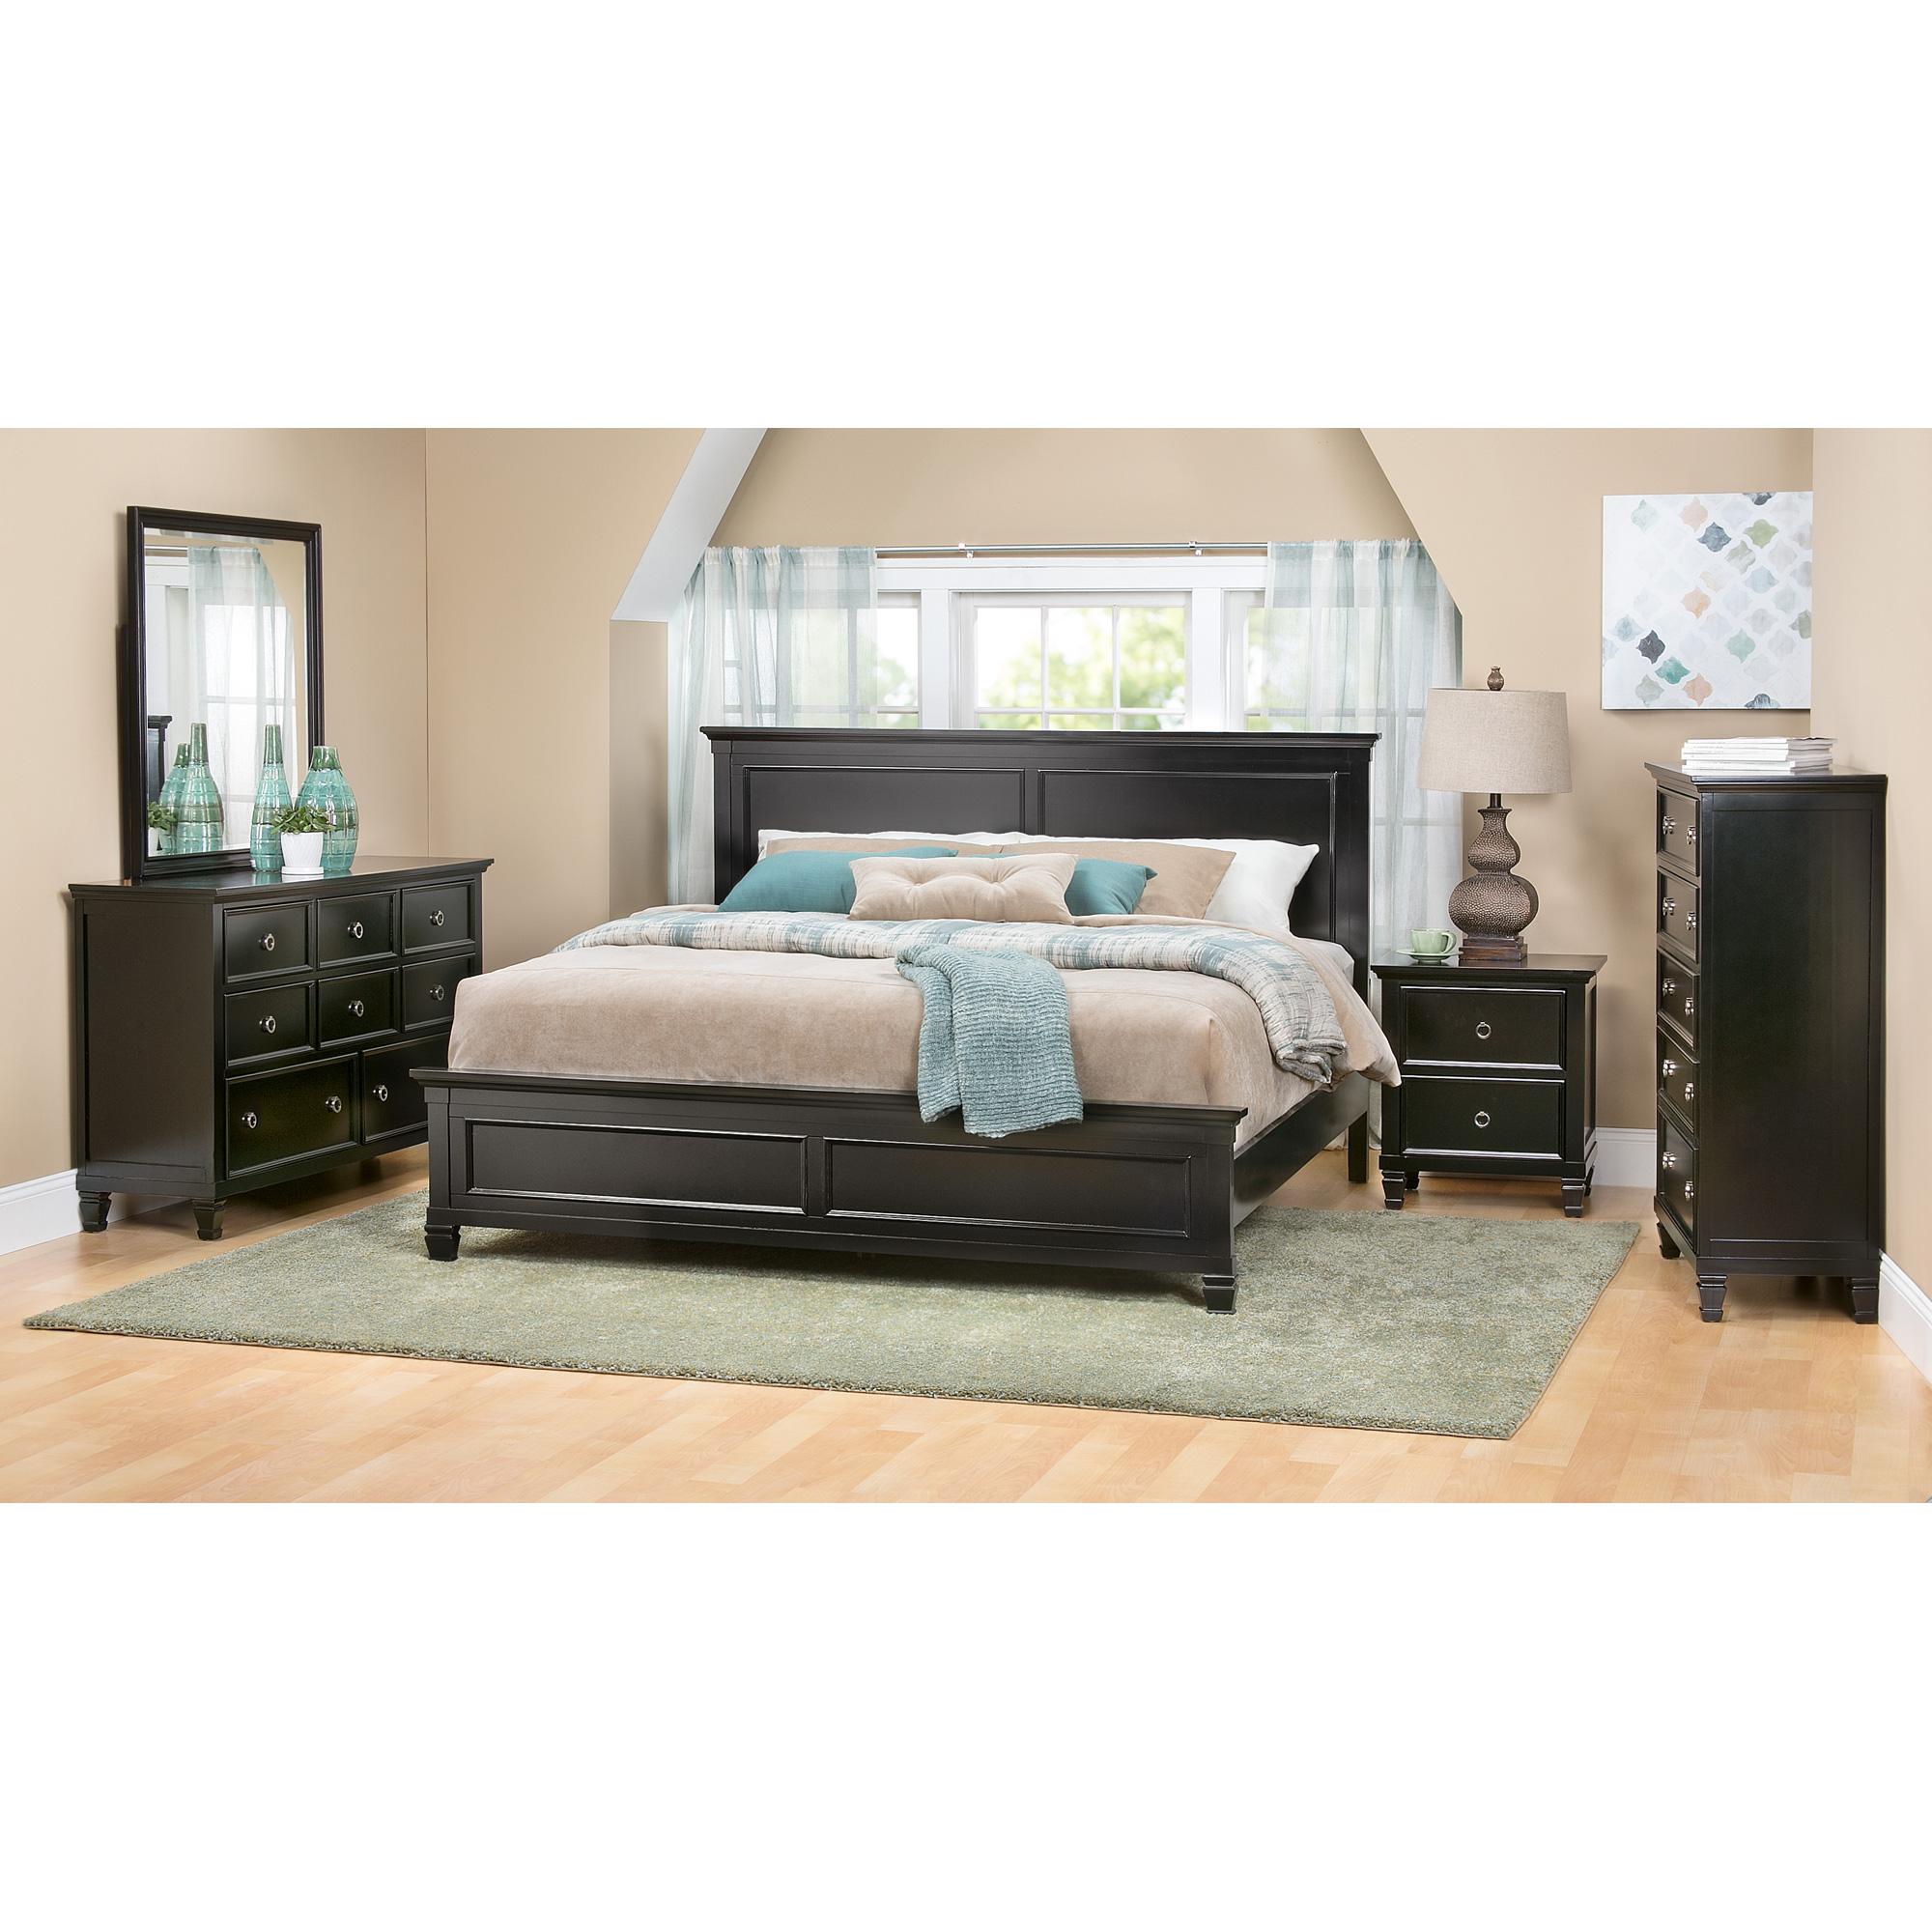 New Classic | Persia II Black California King 4 Piece Room Group Bedroom Set